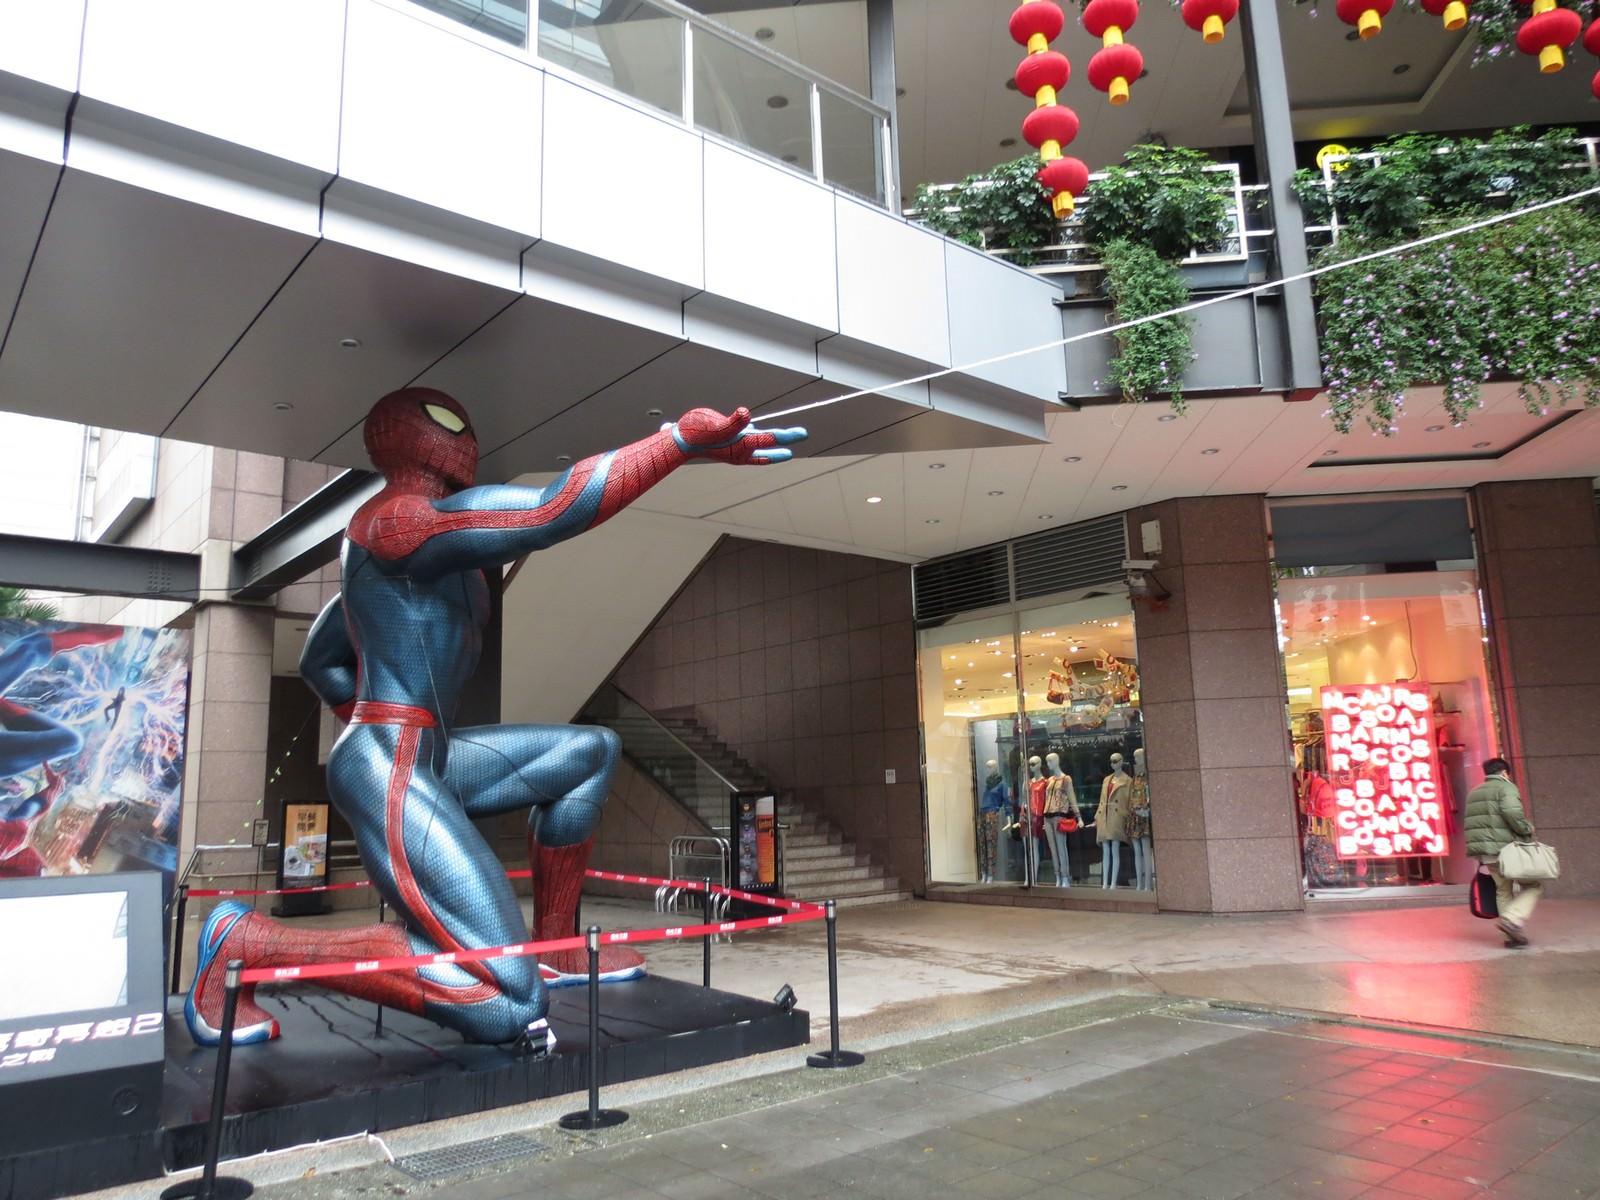 Movie, The Amazing Spider-Man 2(美國) / 蜘蛛人驚奇再起2:電光之戰(台) / 超凡蜘蛛侠2(中) / 蜘蛛俠2:決戰電魔(港), 廣告看板, 電影宣傳模型, 信義新天地